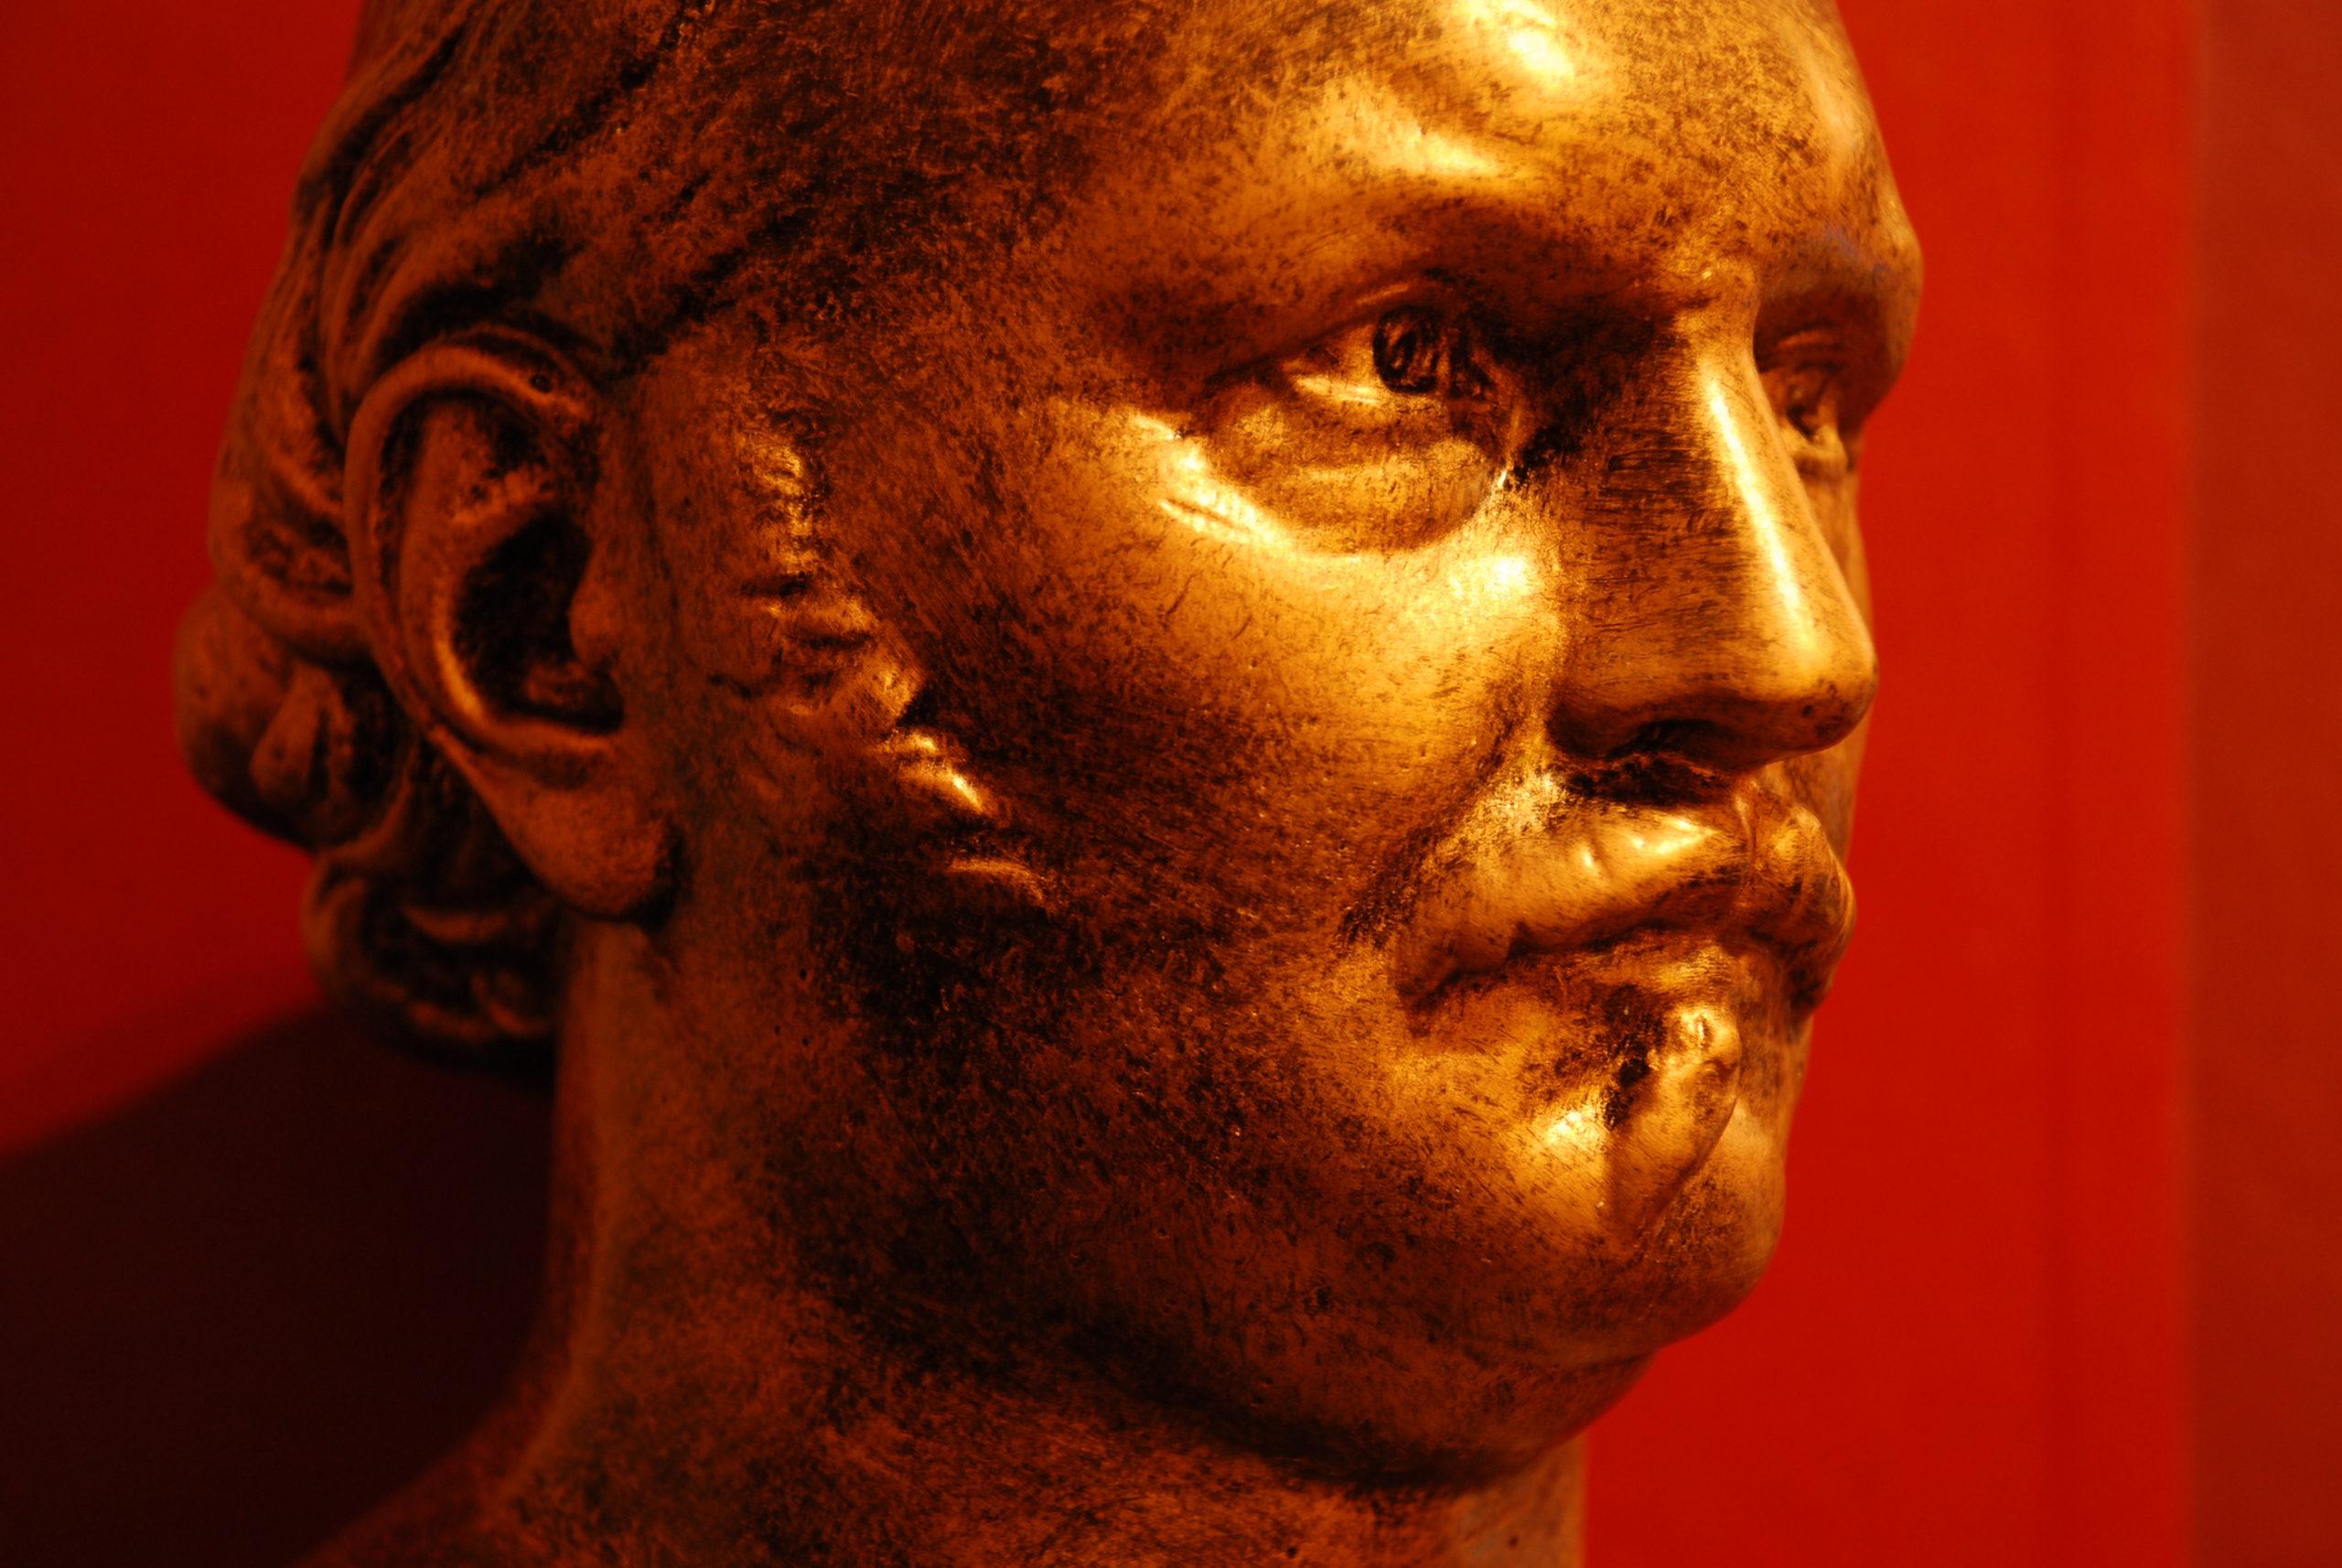 Busto de Allan Kardec em bronze